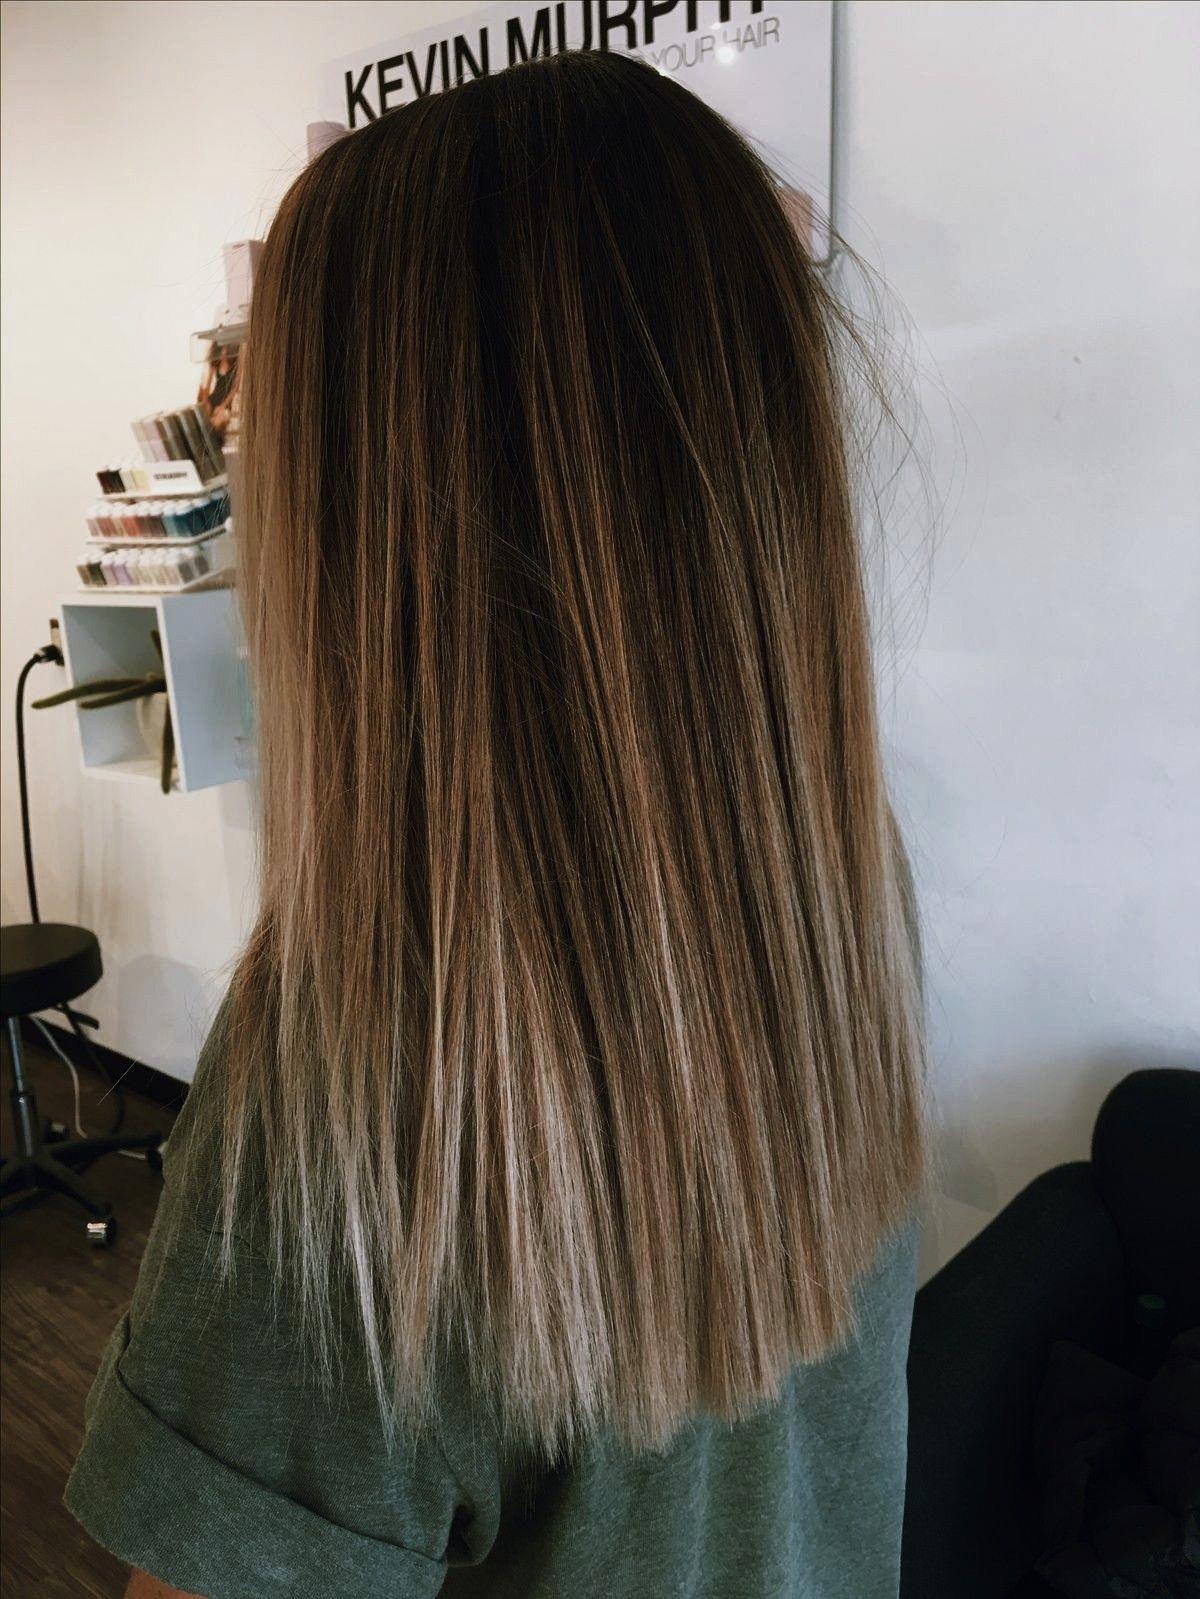 Smooth Straight Hair Naturally Fashion Hairstyle Hair Style For Long Straight Hair 20190308 Hair Styles Long Hair Styles Light Brown Hair